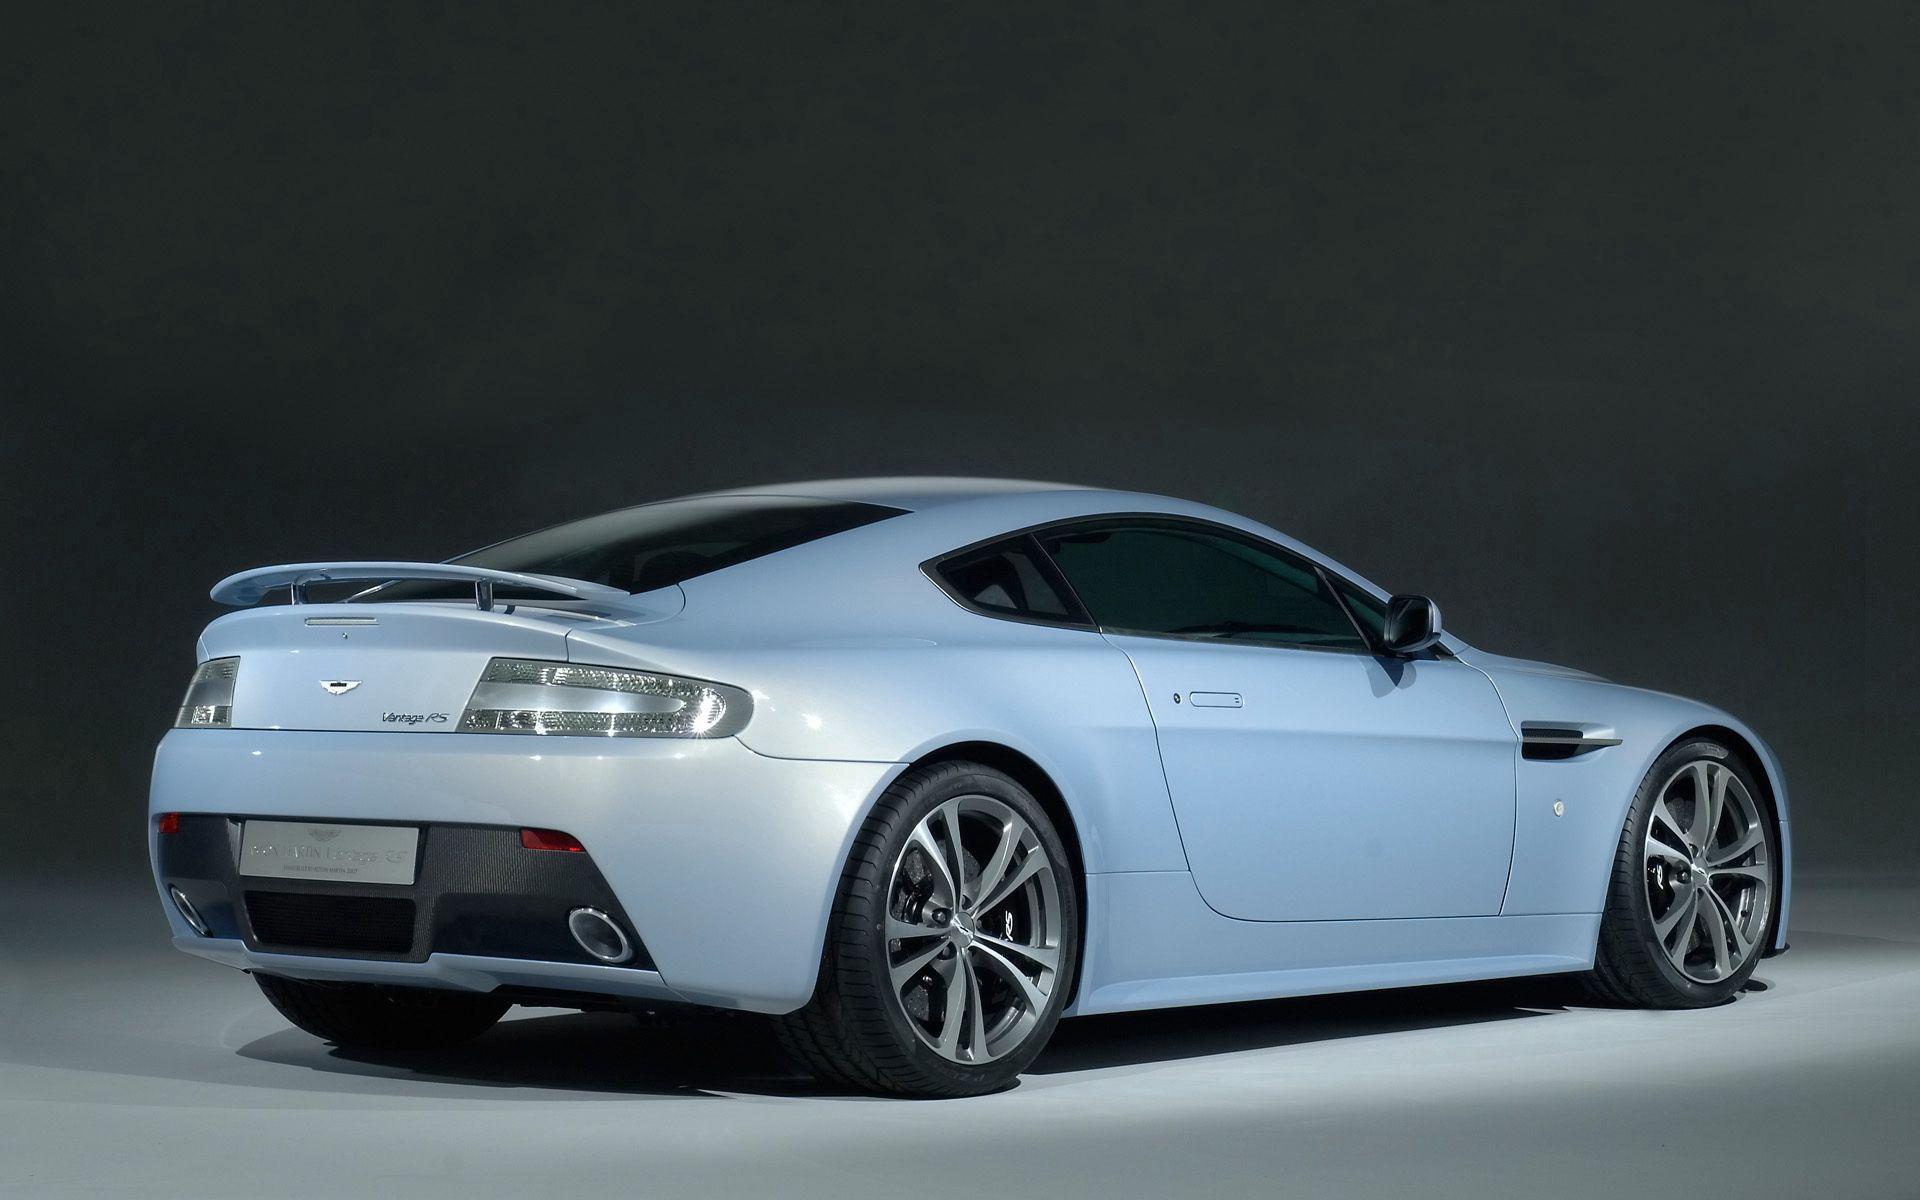 62550 Заставки и Обои Астон Мартин (Aston Martin) на телефон. Скачать Астон Мартин (Aston Martin), Тачки (Cars), Concept, Vantage, V12, Rs картинки бесплатно